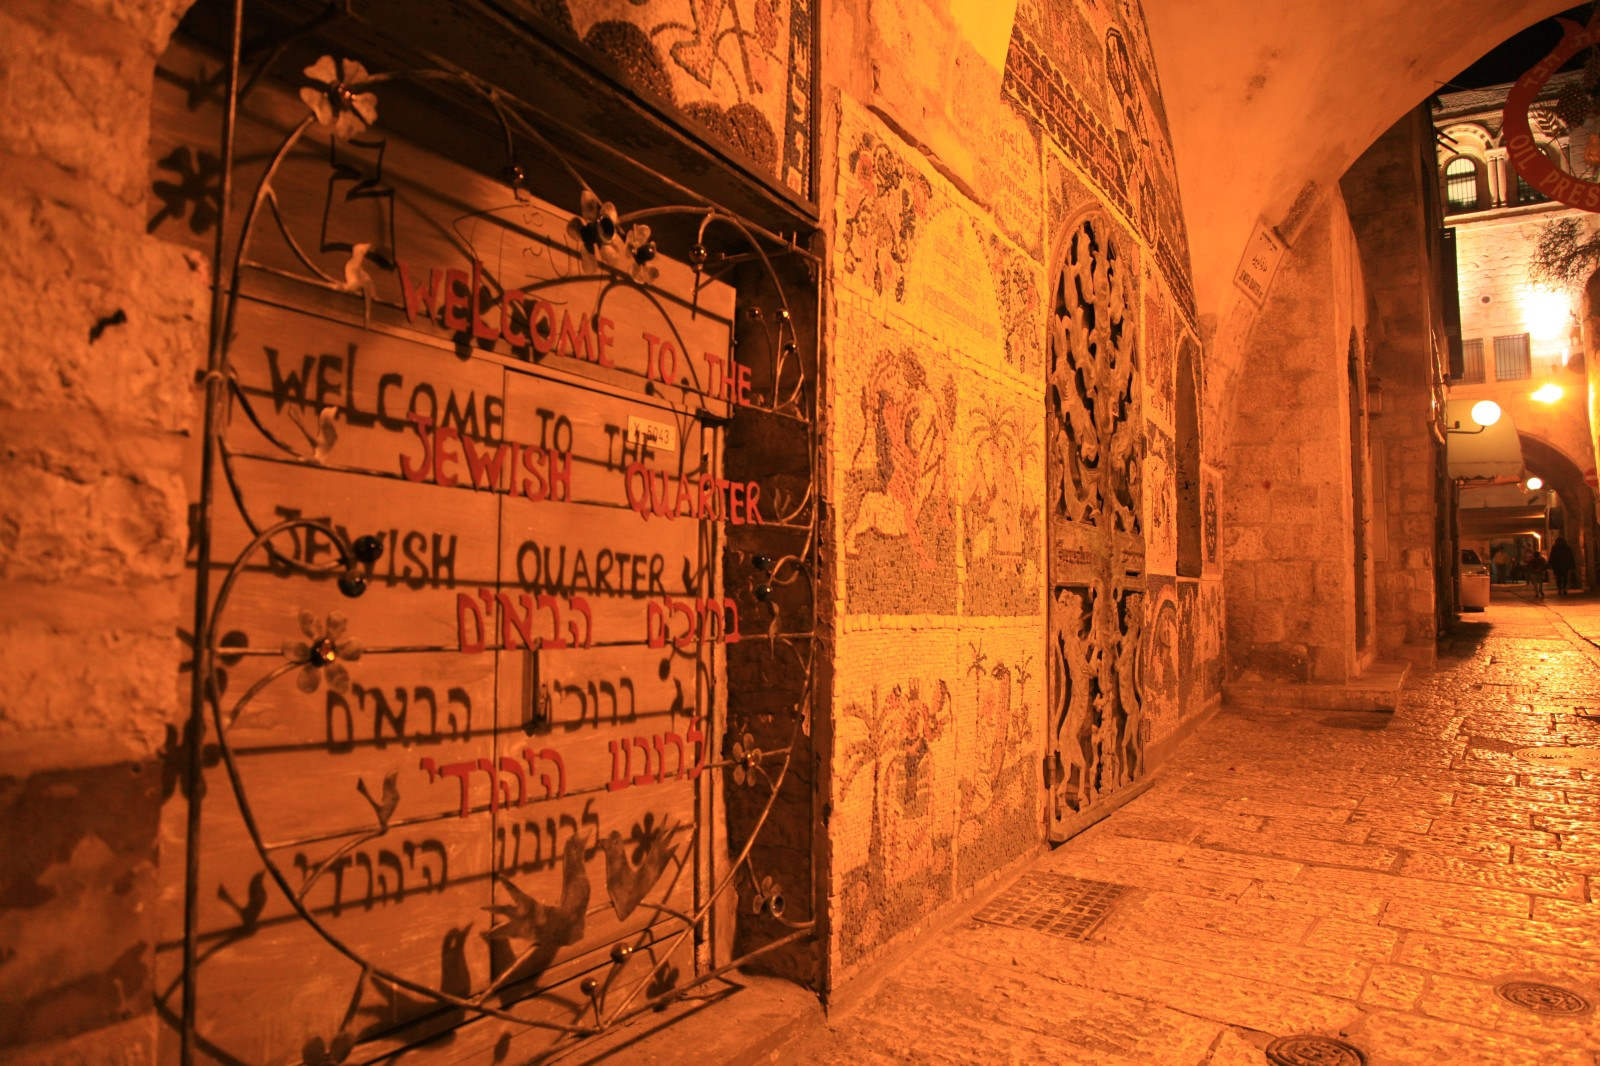 Jewish quarter welcomes you!